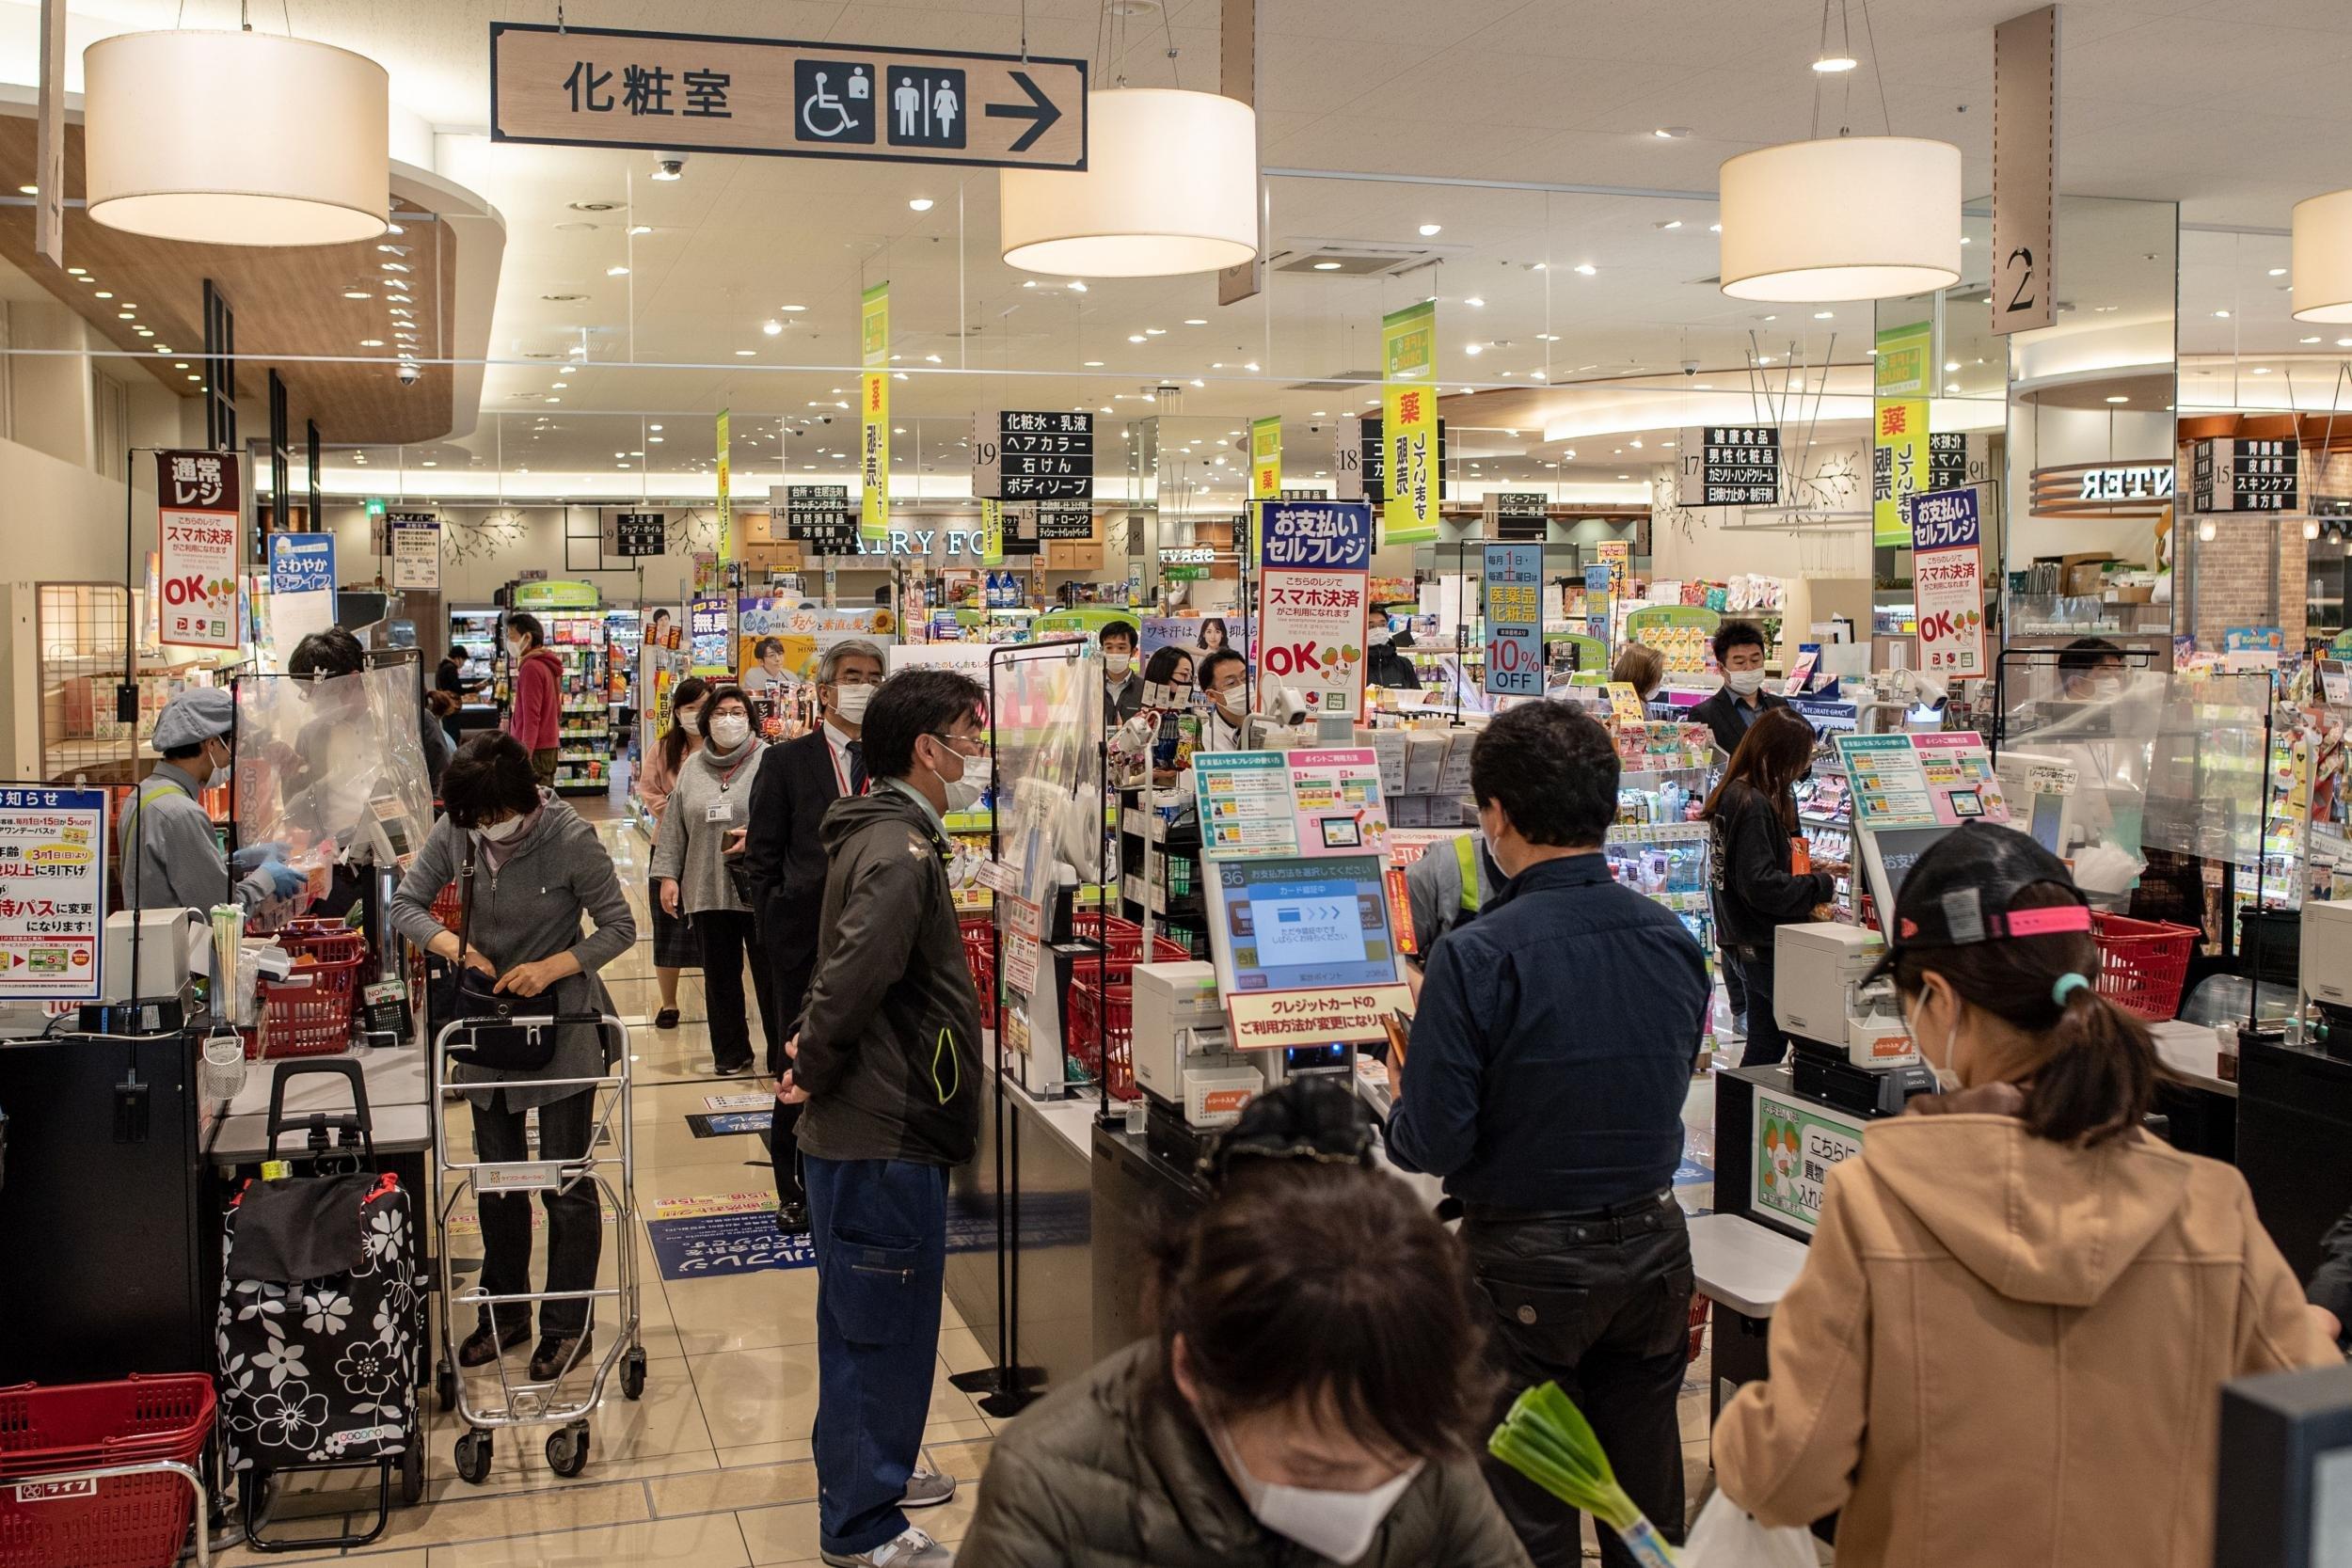 Japanese mayor says men should do shopping as women take too long ...